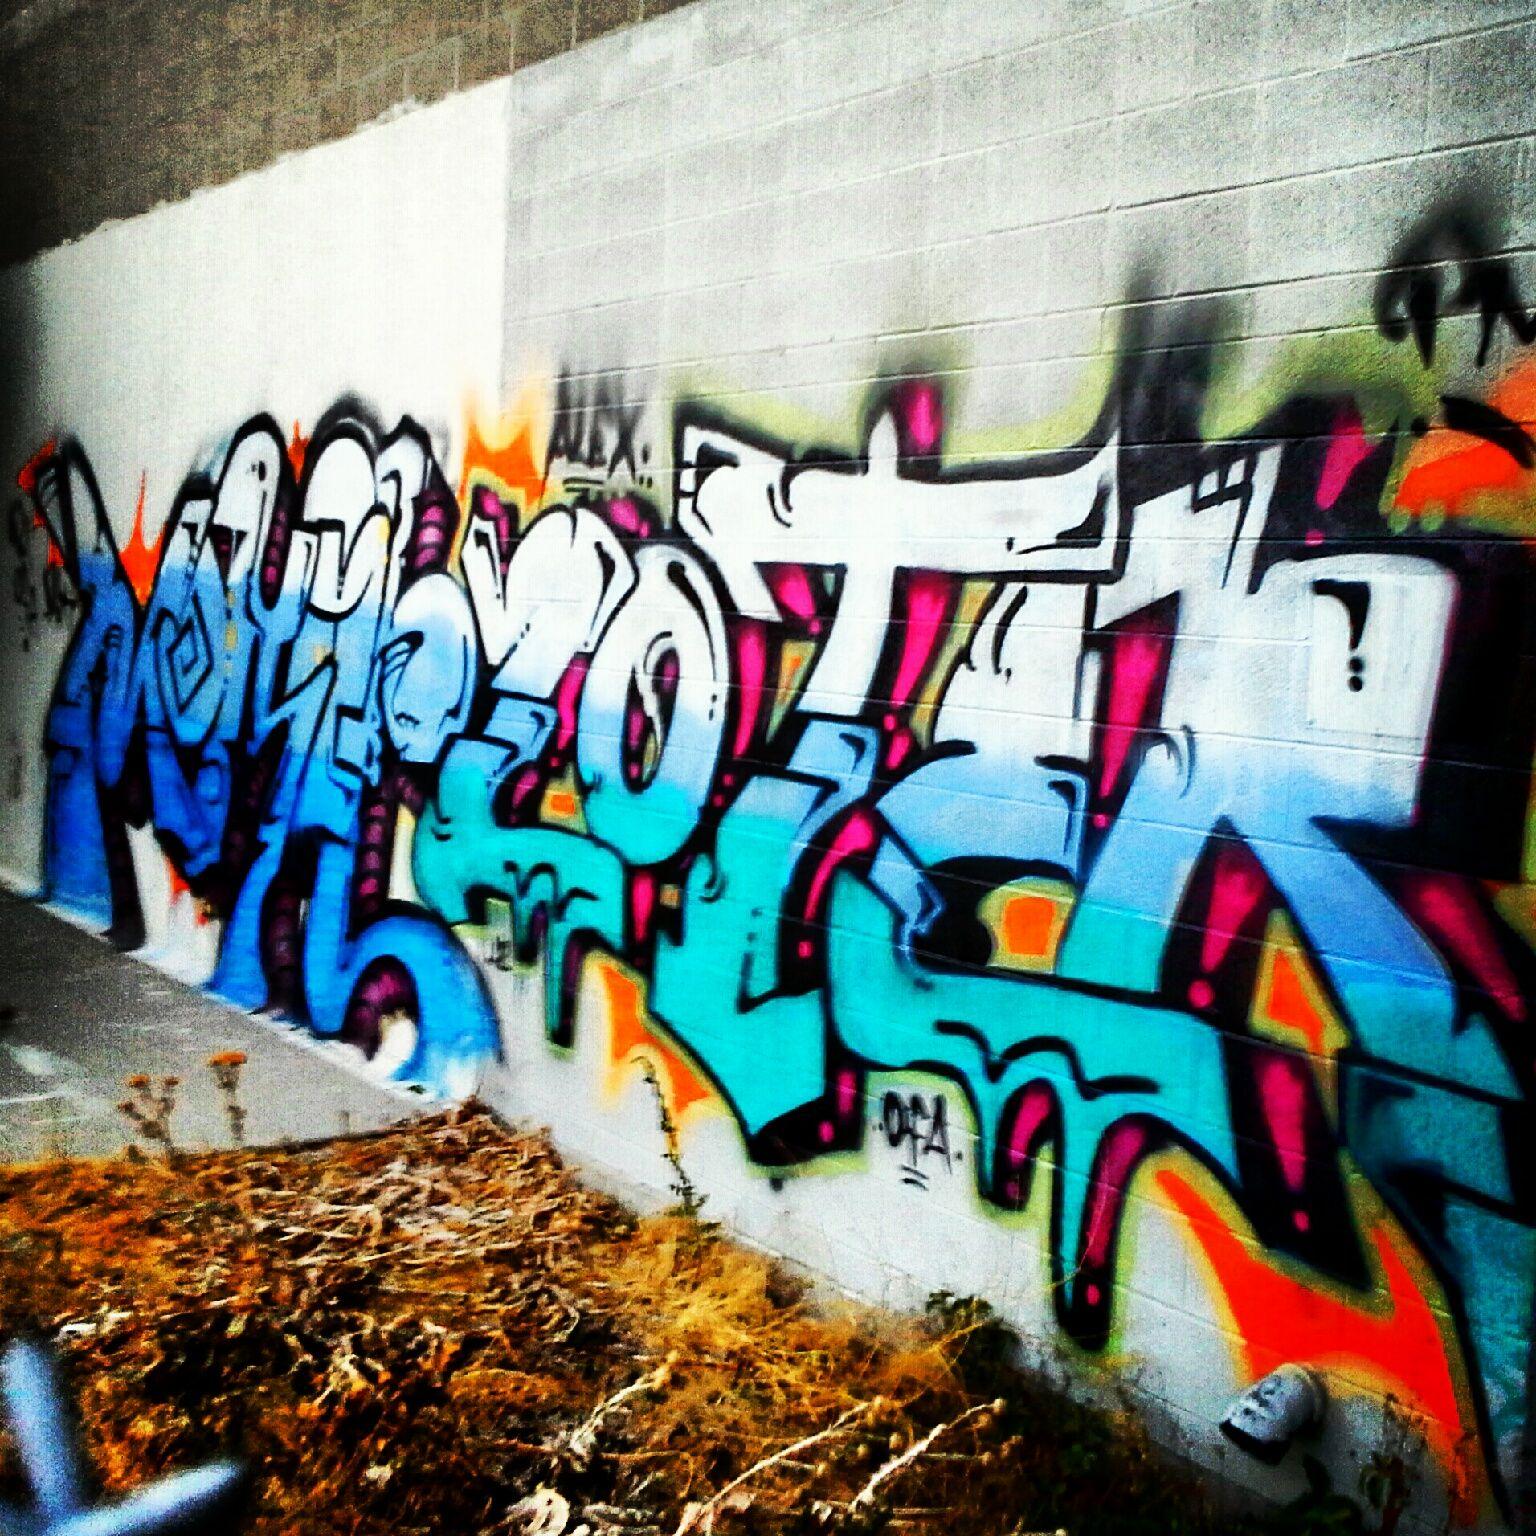 MELROSEandFAIRFAX: Suicide Rock - Graffiti in Salt Lake City 1/3